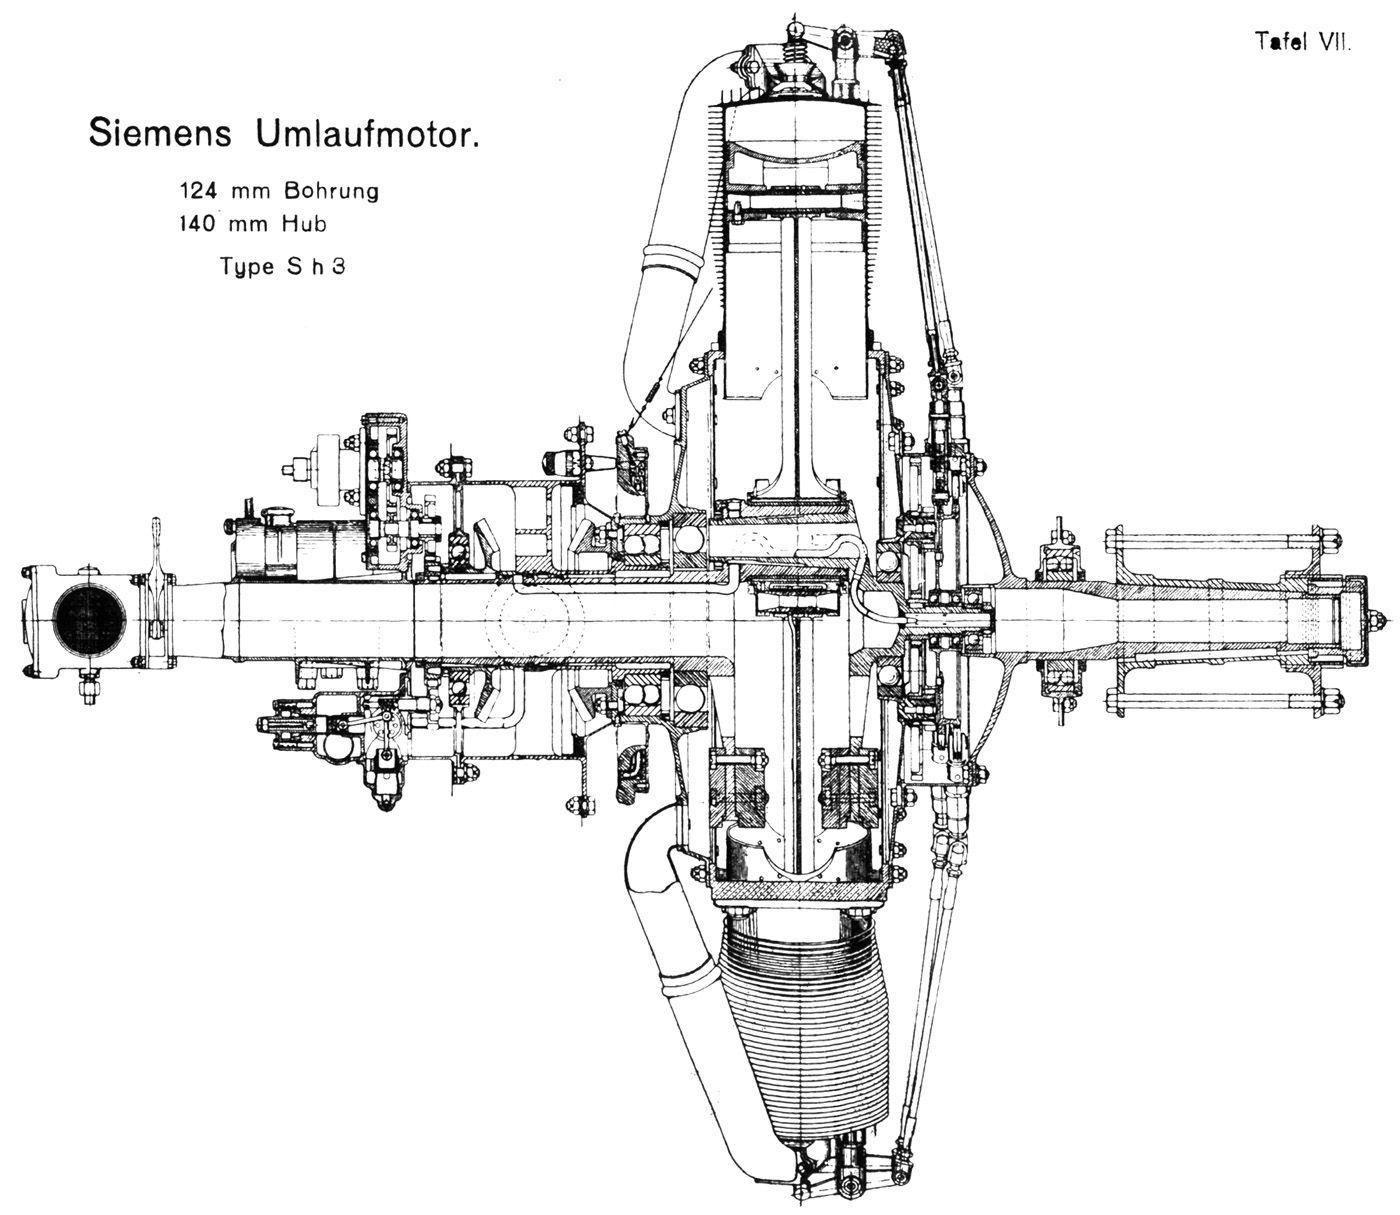 Siemenshalskesh3longx